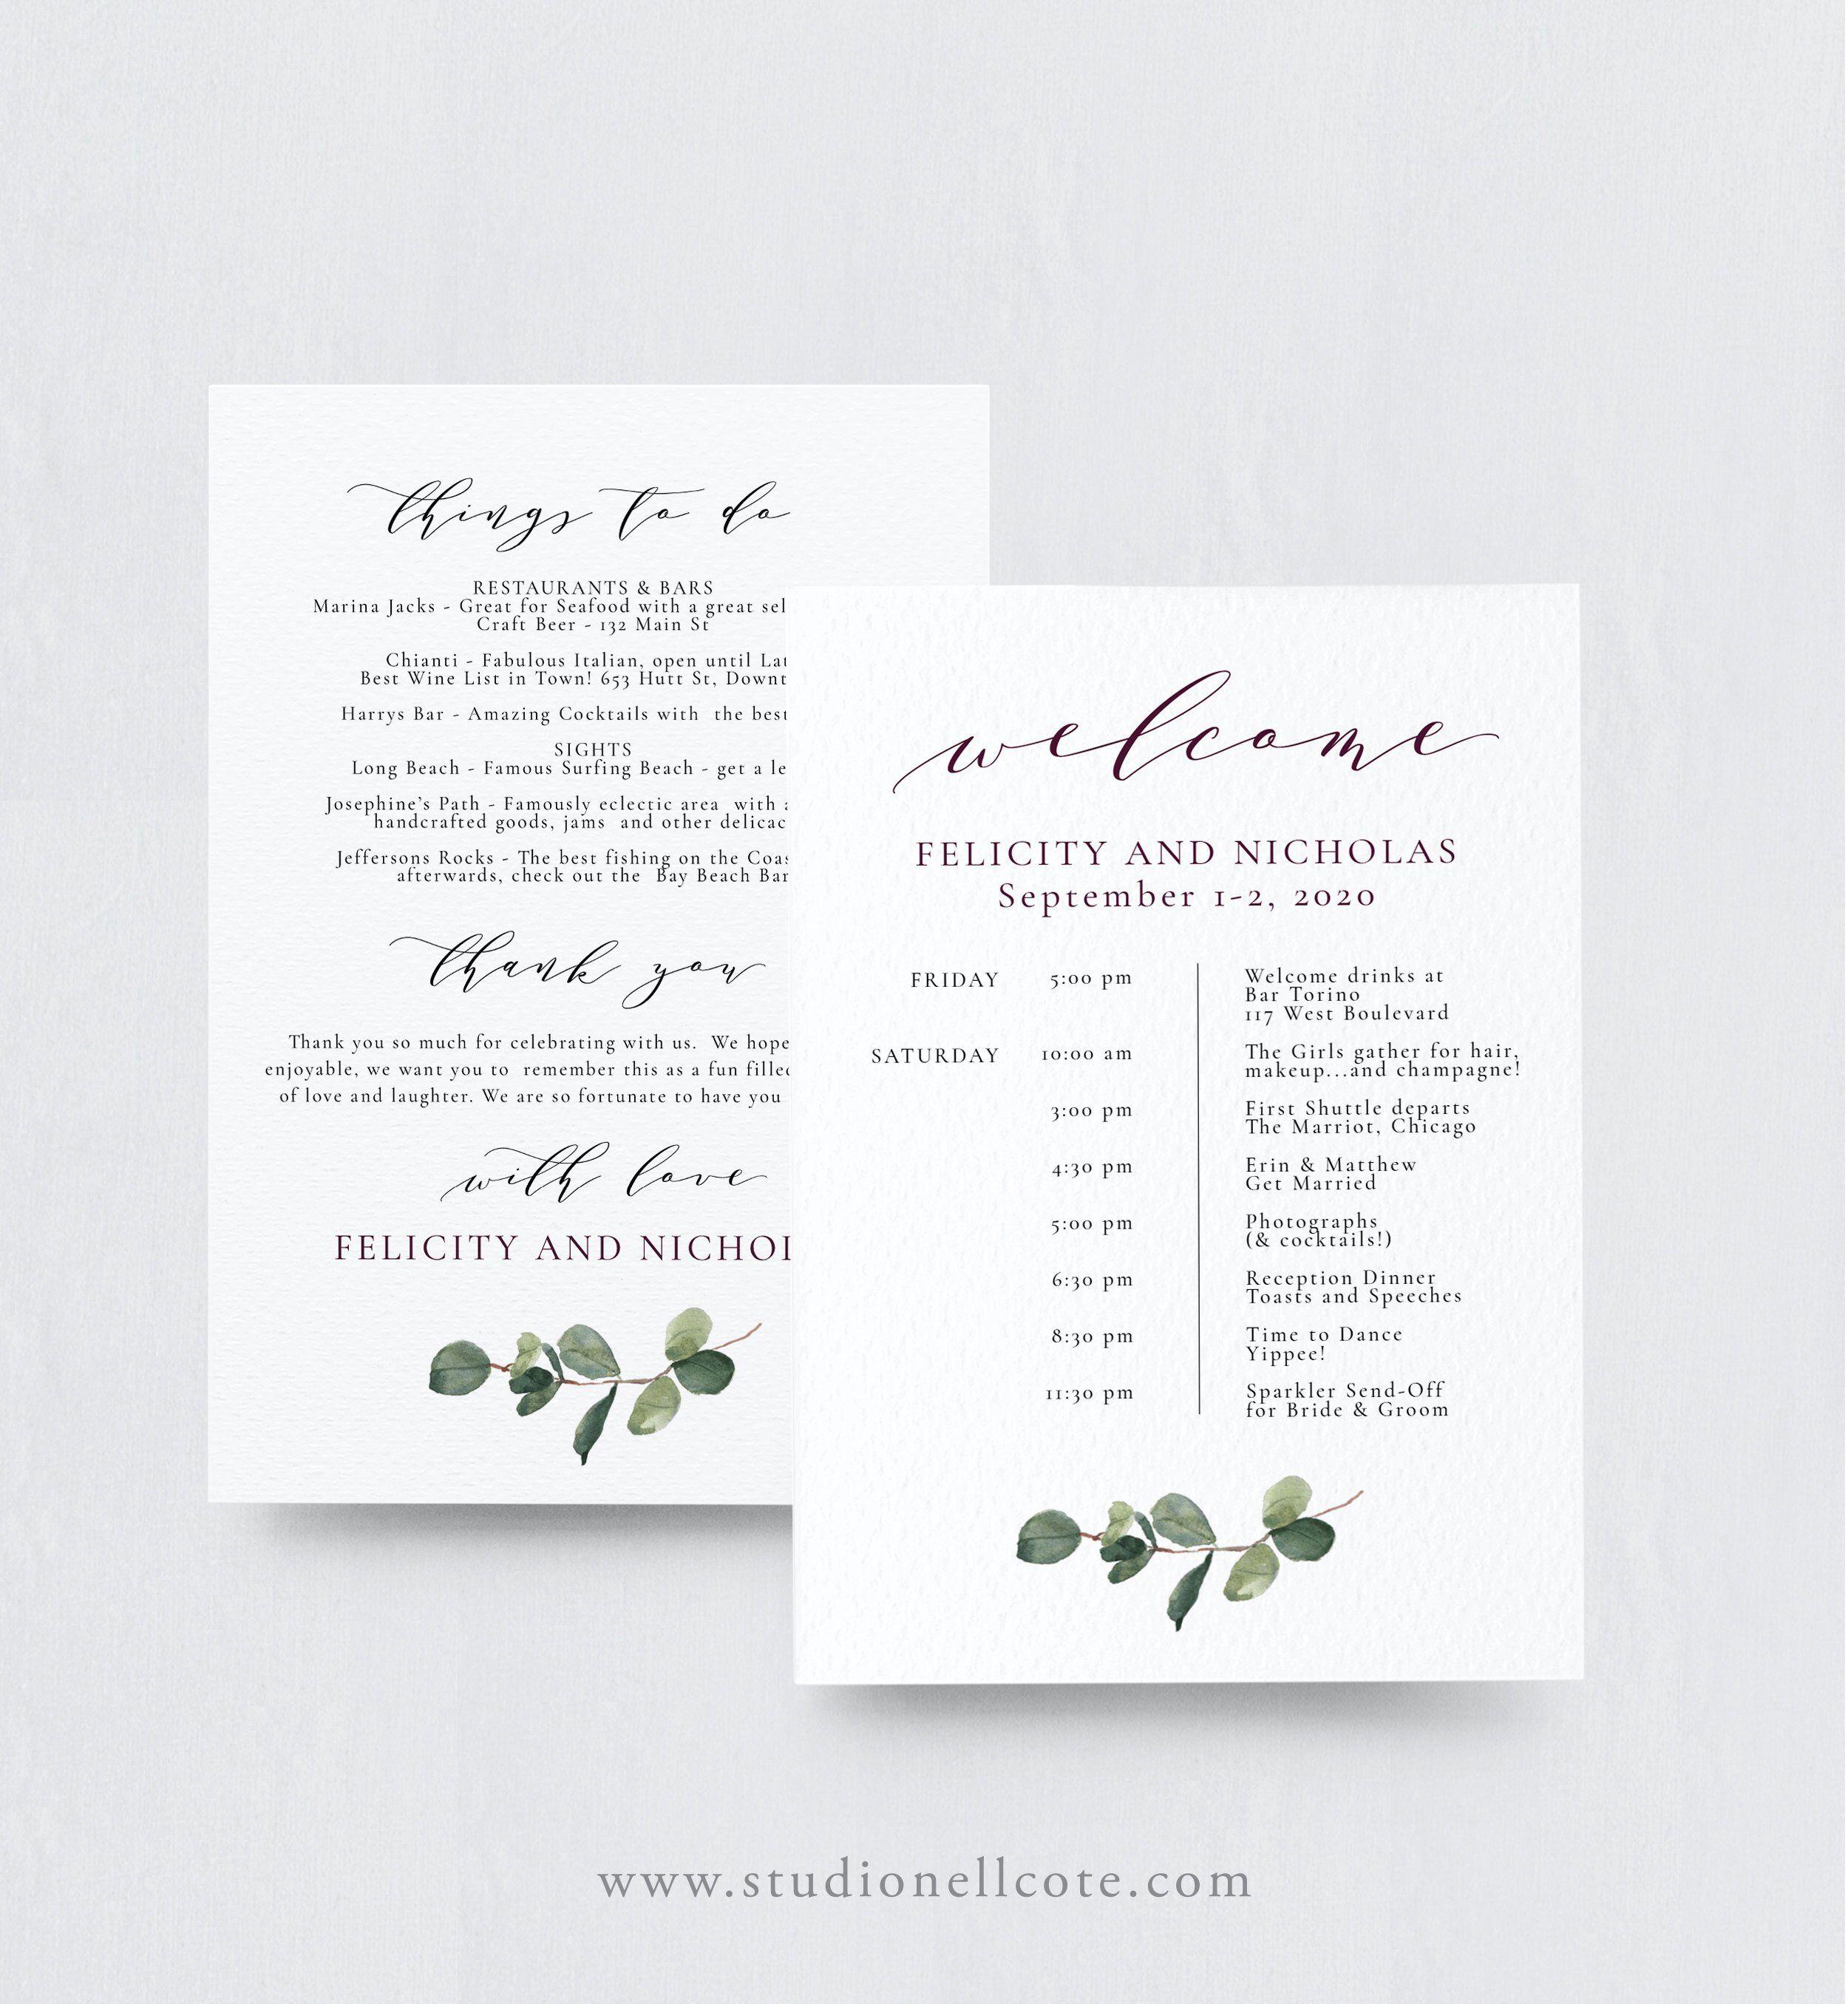 Eucalyptus Wedding Itinerary Itinerary For Guests Wedding Etsy Wedding Itinerary Wedding Itinerary Template Wedding Agenda